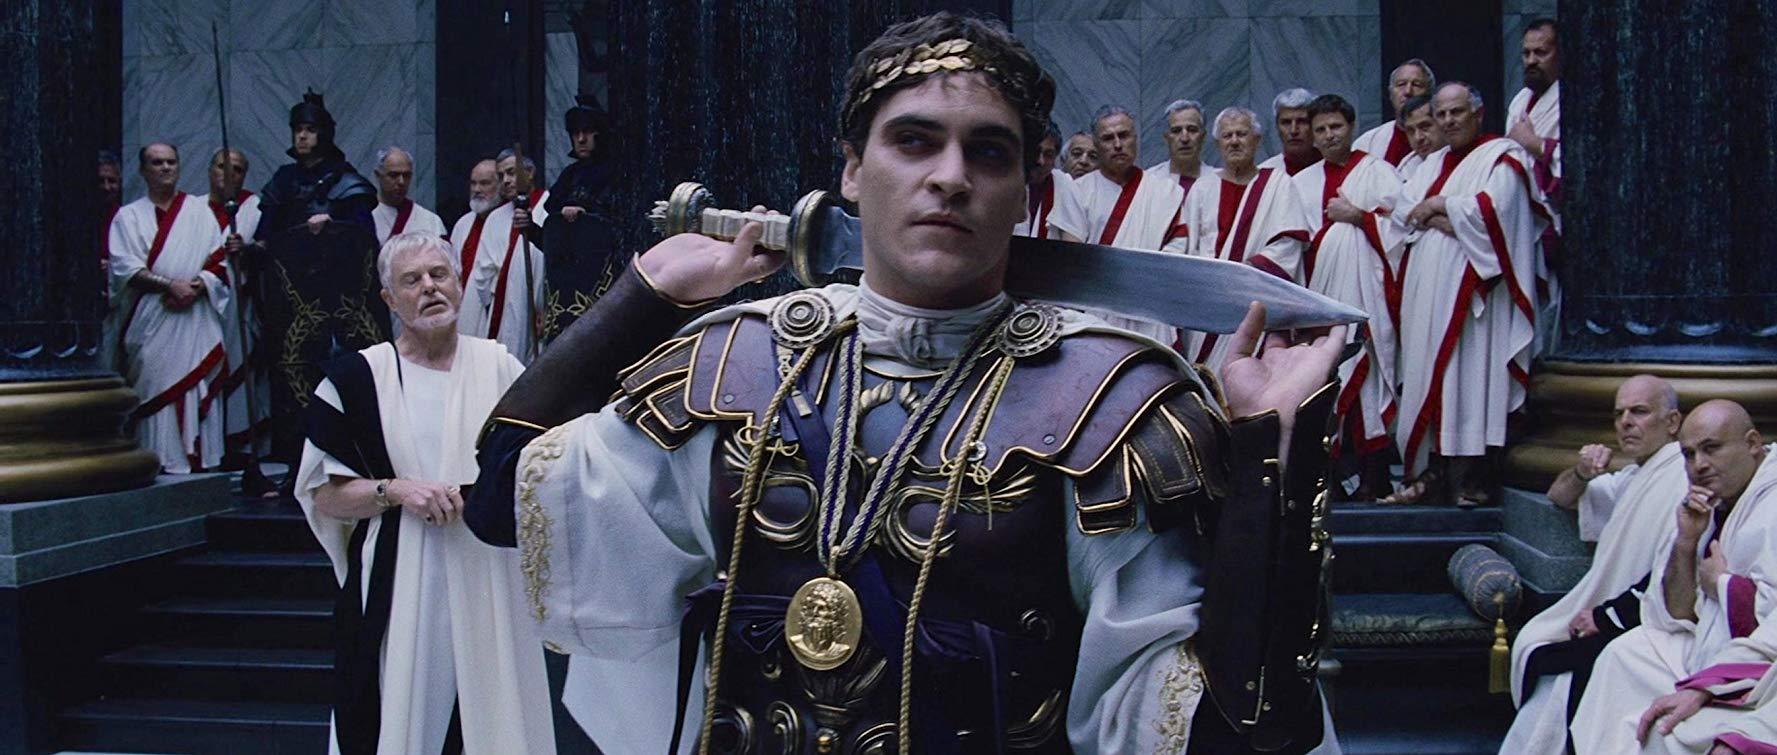 Гладиатор (Gladiator) 2000